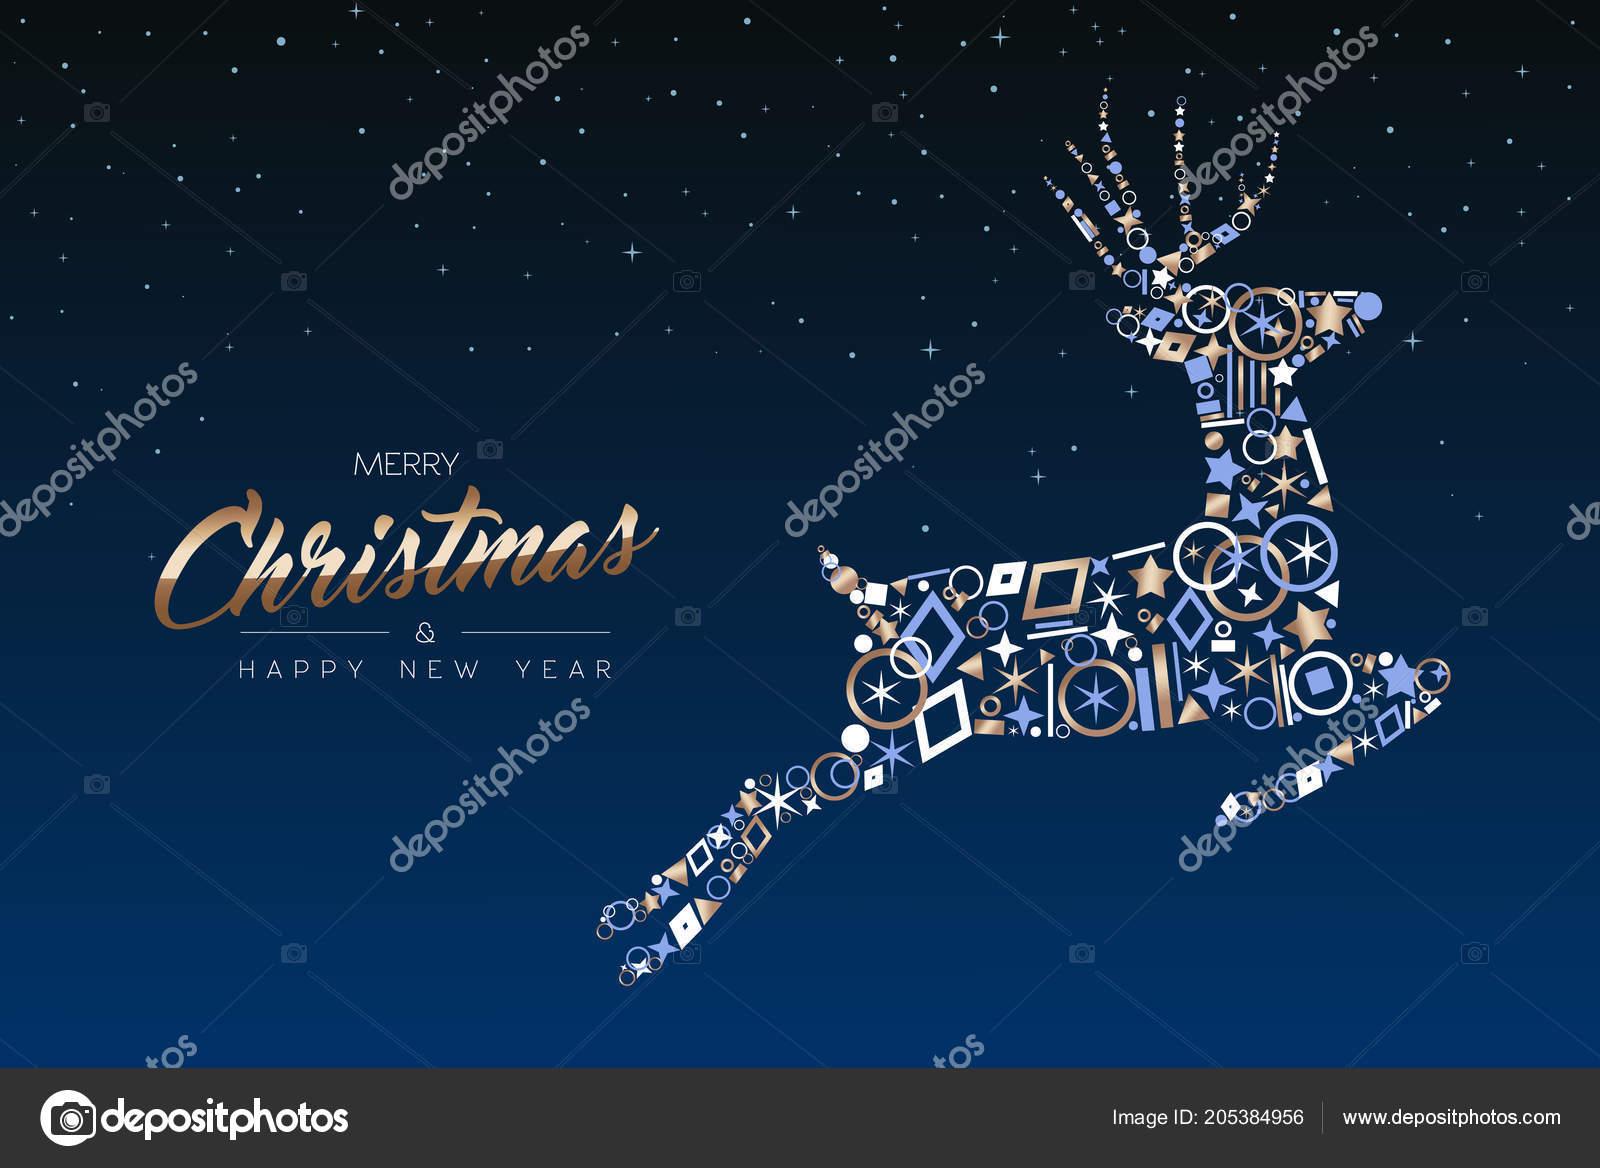 Auguri Di Buon Natale Eleganti.Cartolina Auguri Buon Natale Felice Anno Nuovo Renna Natale Elegante